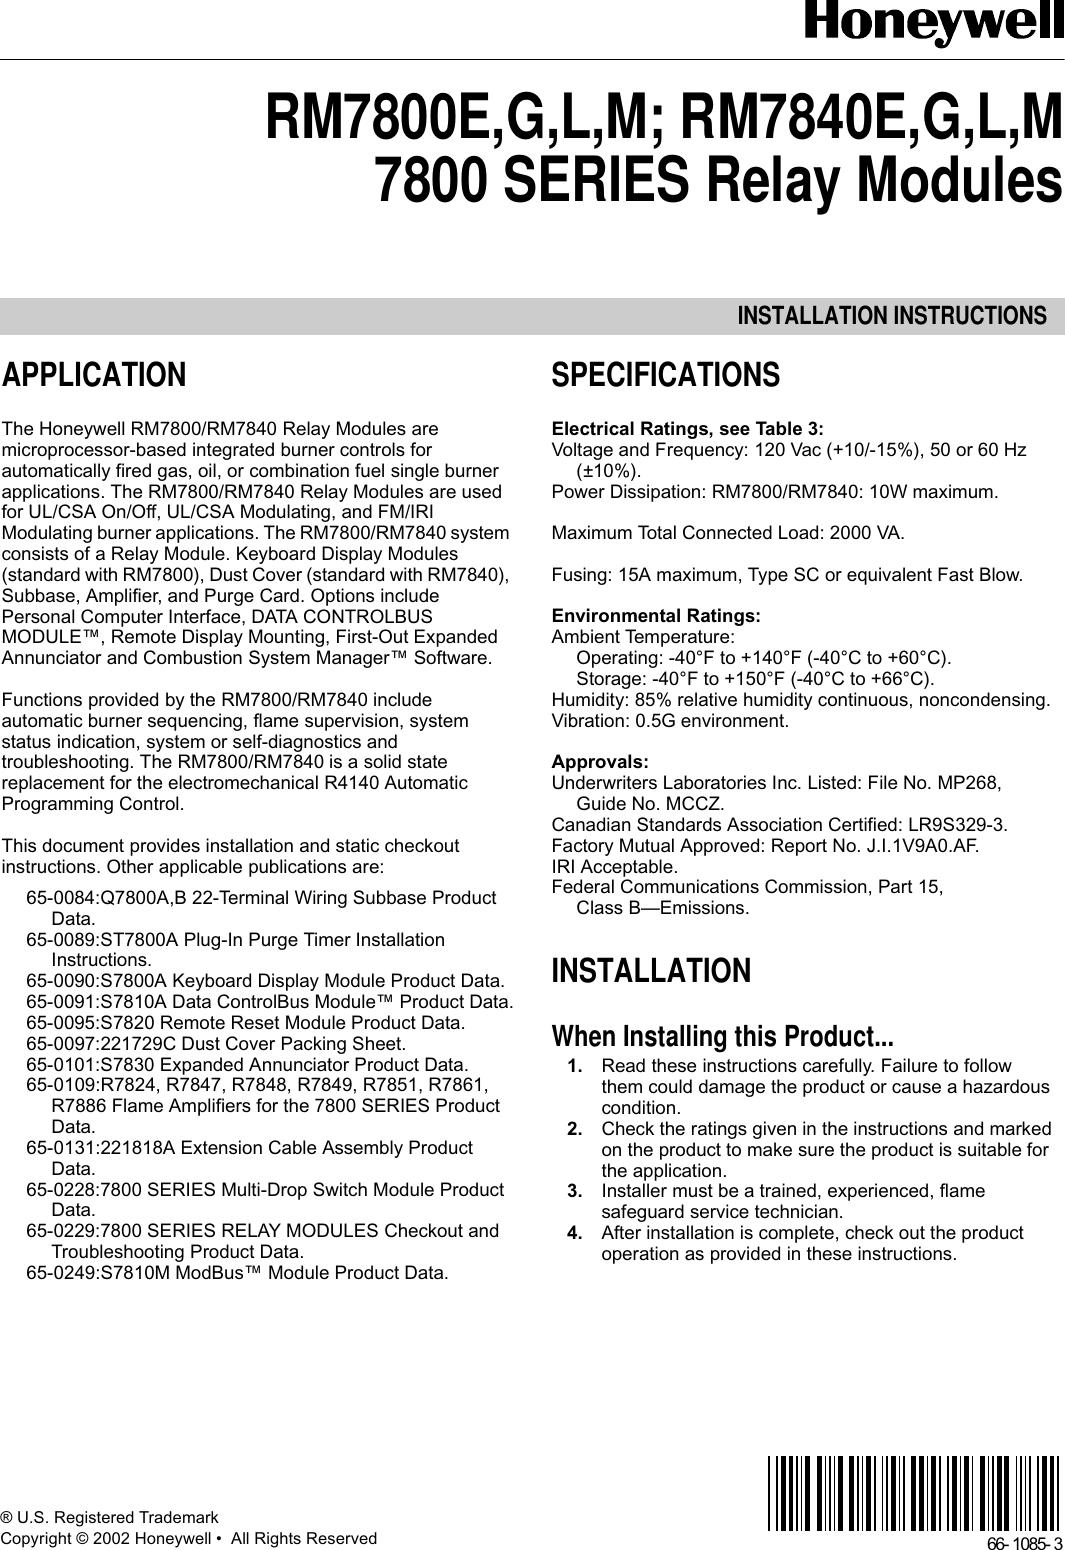 honeywell thermostat rm7800eglm rm7840eglm users manual 66 1085 rh  usermanual wiki